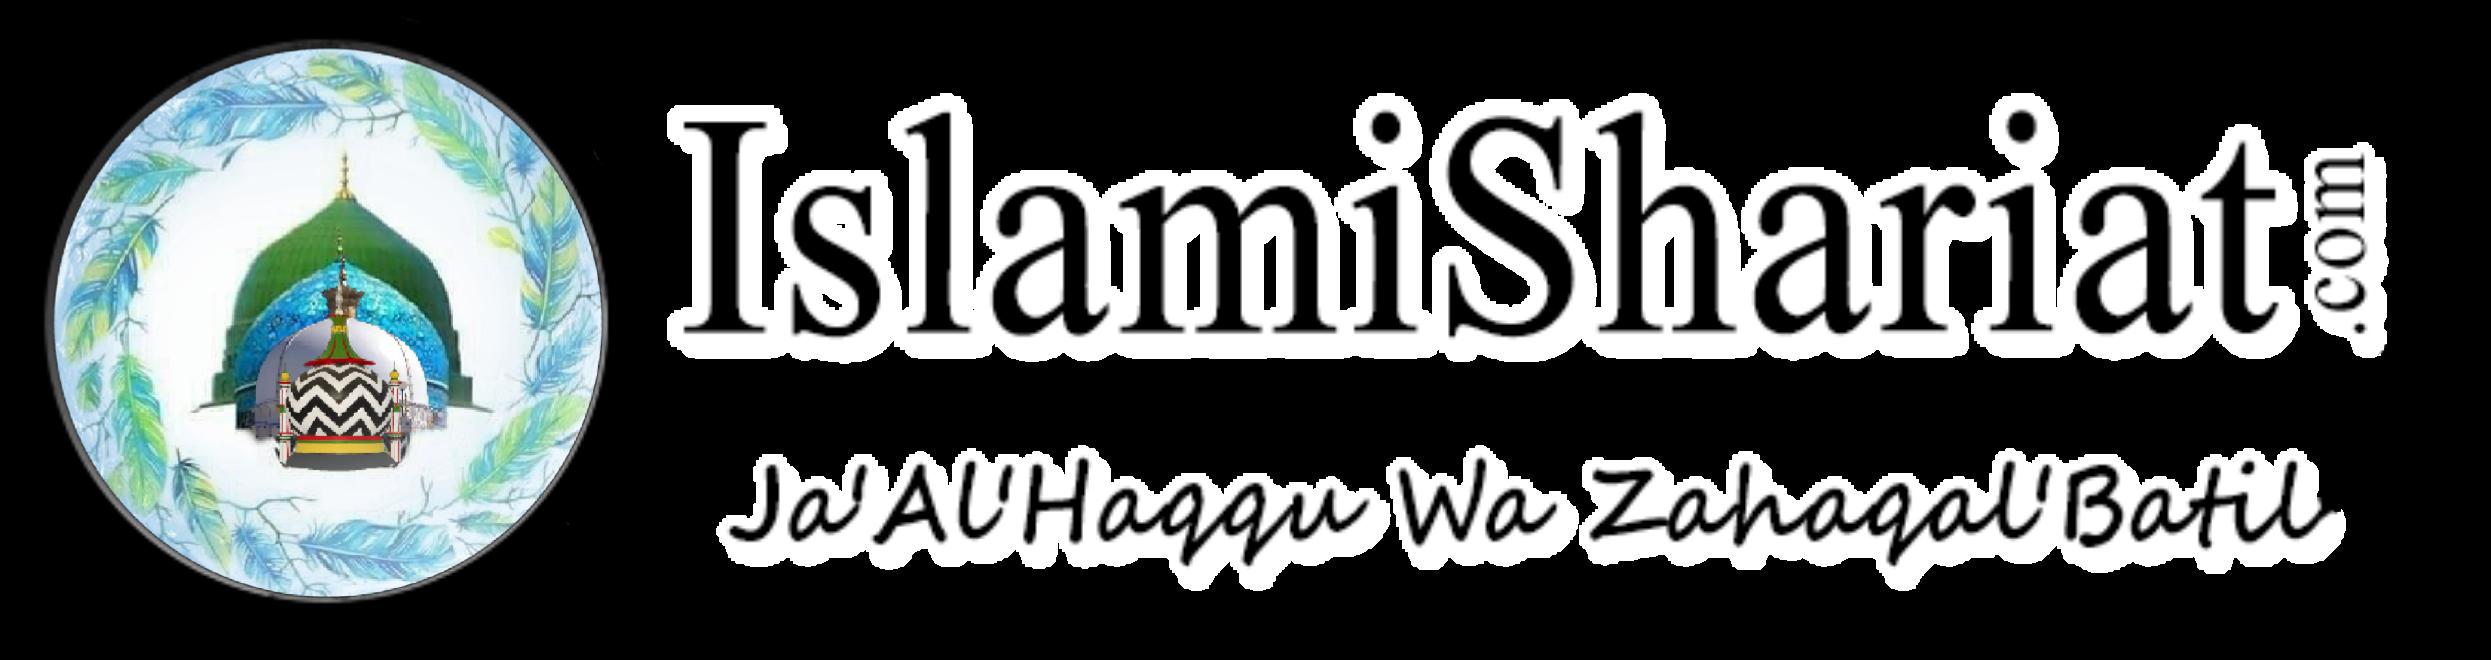 IslamiShariat.com